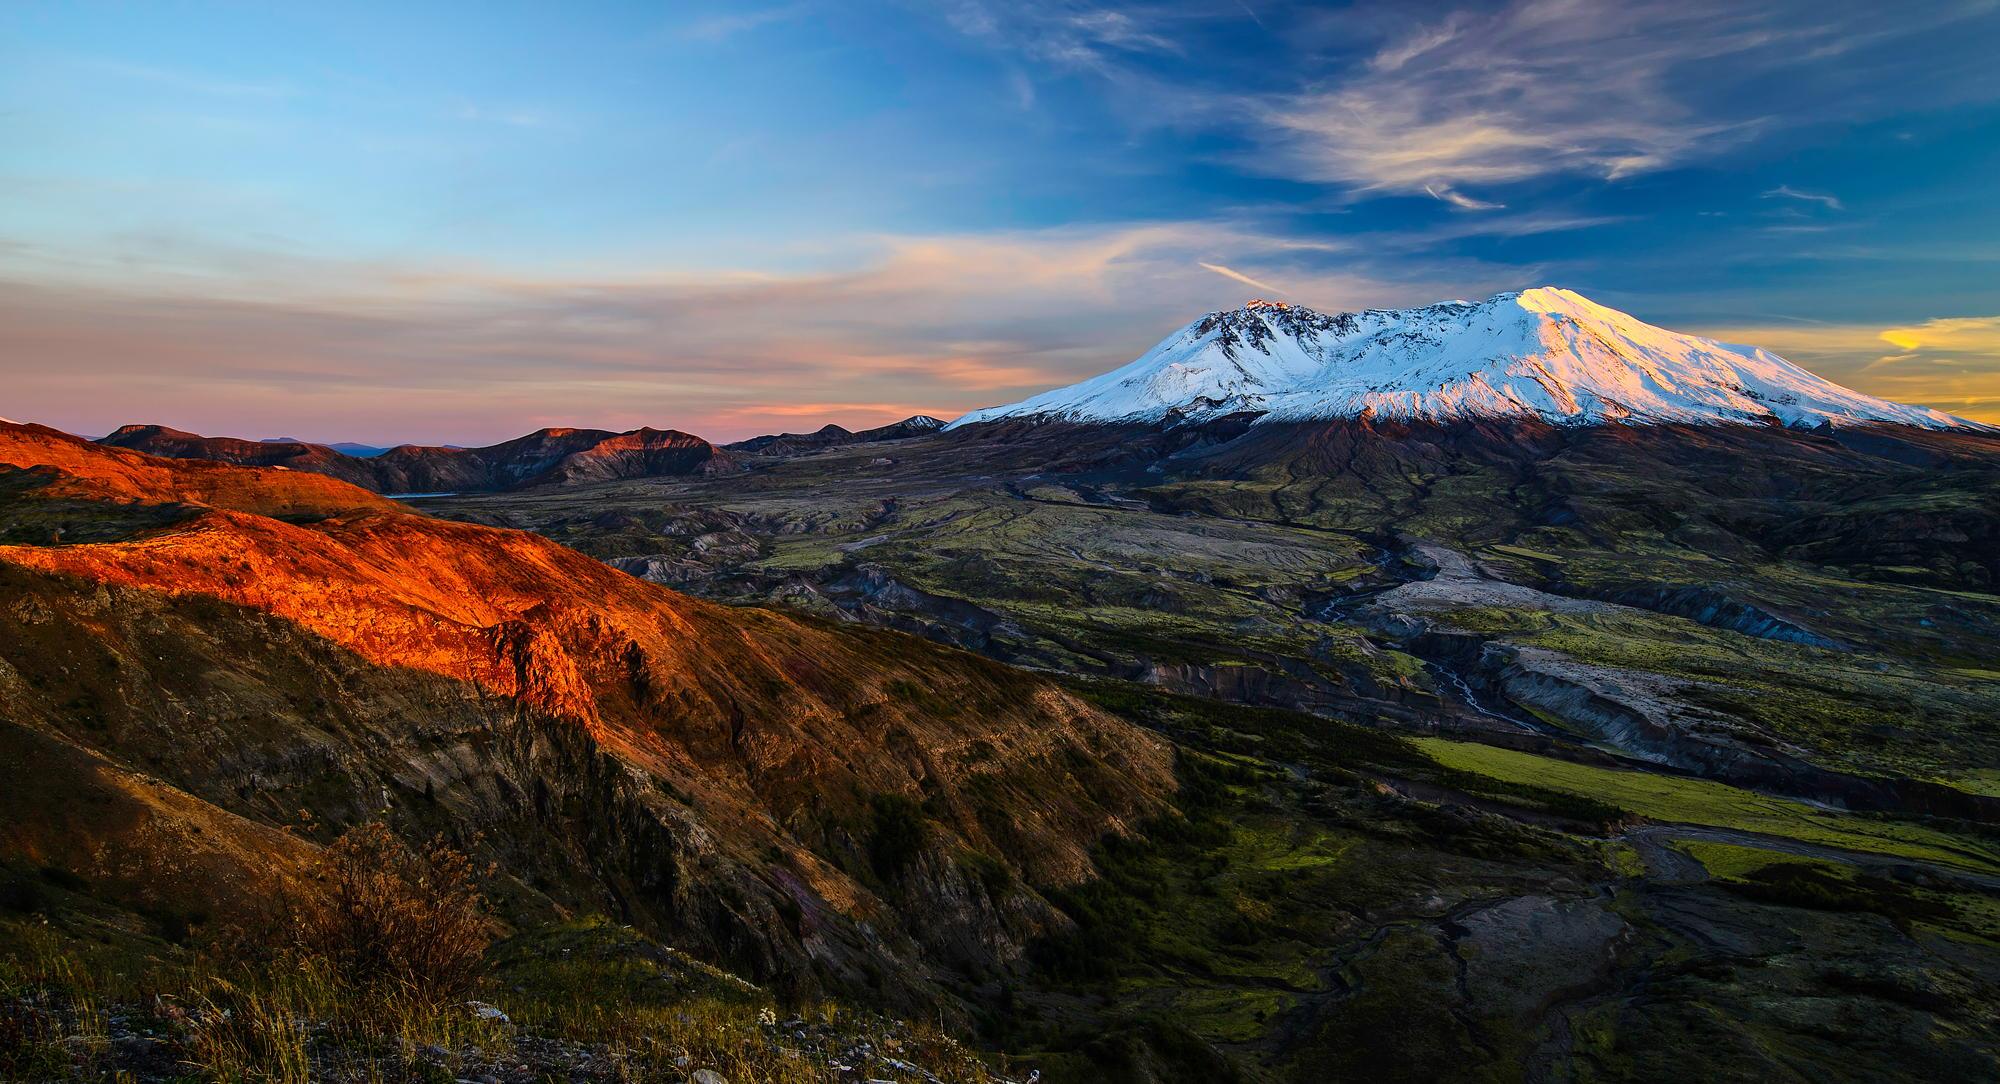 Best 48 Mount St Helens Wallpaper on HipWallpaper Amount 2000x1084